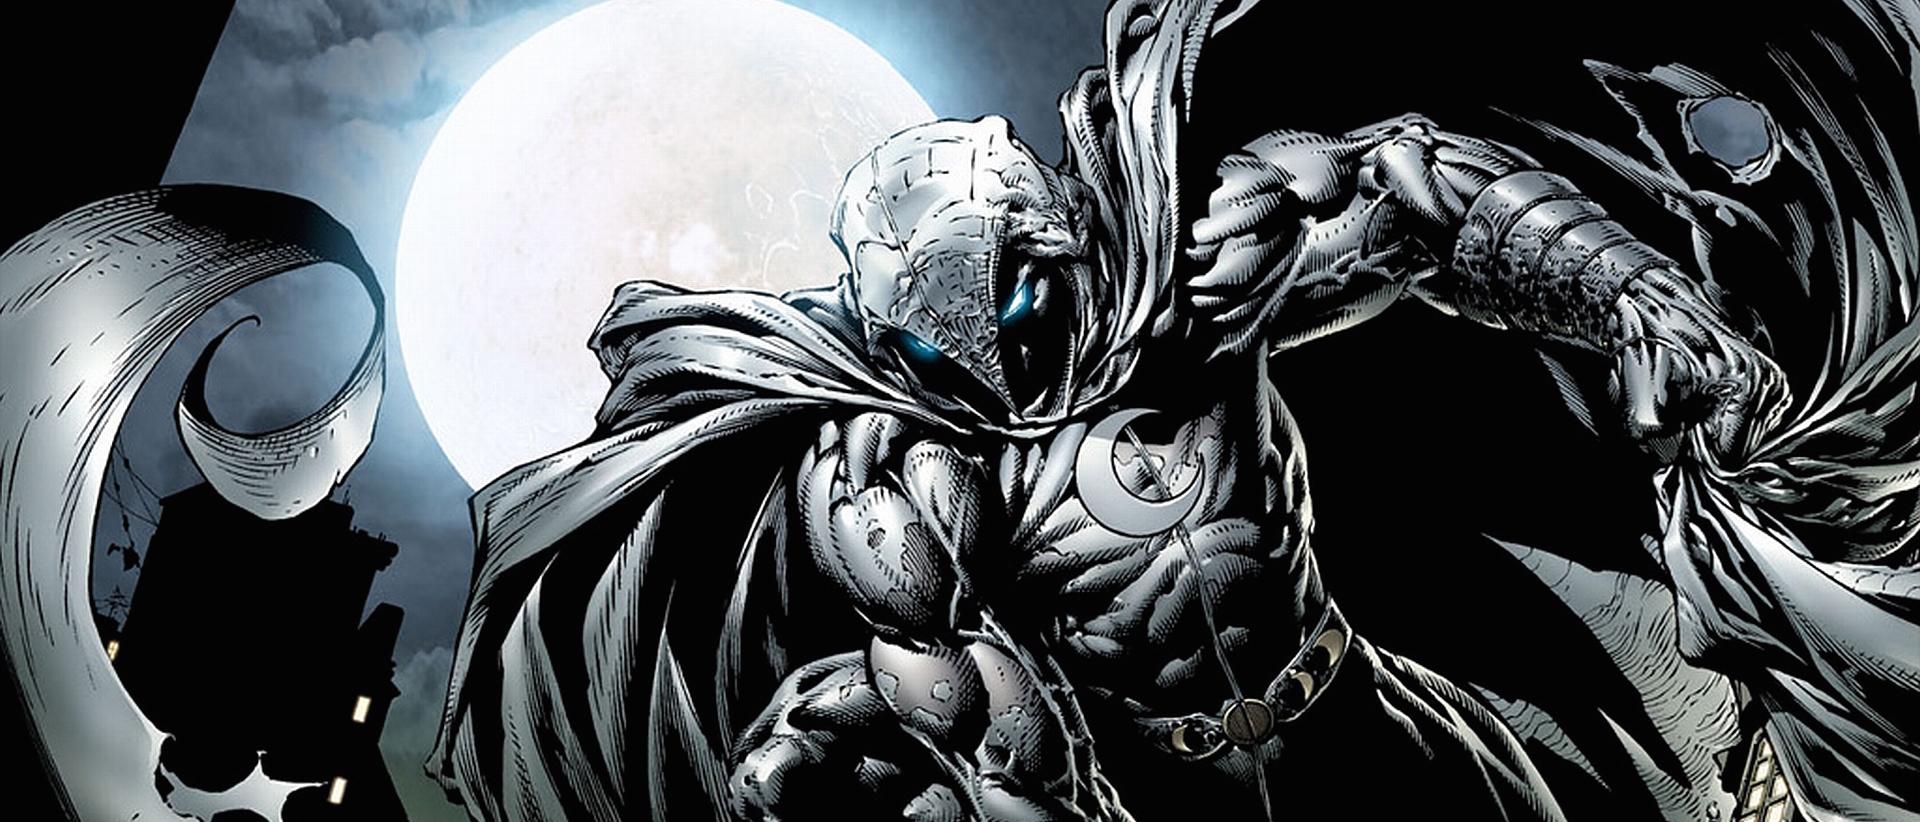 Marvel Rumors: Moon Knight TV Series in the Works?